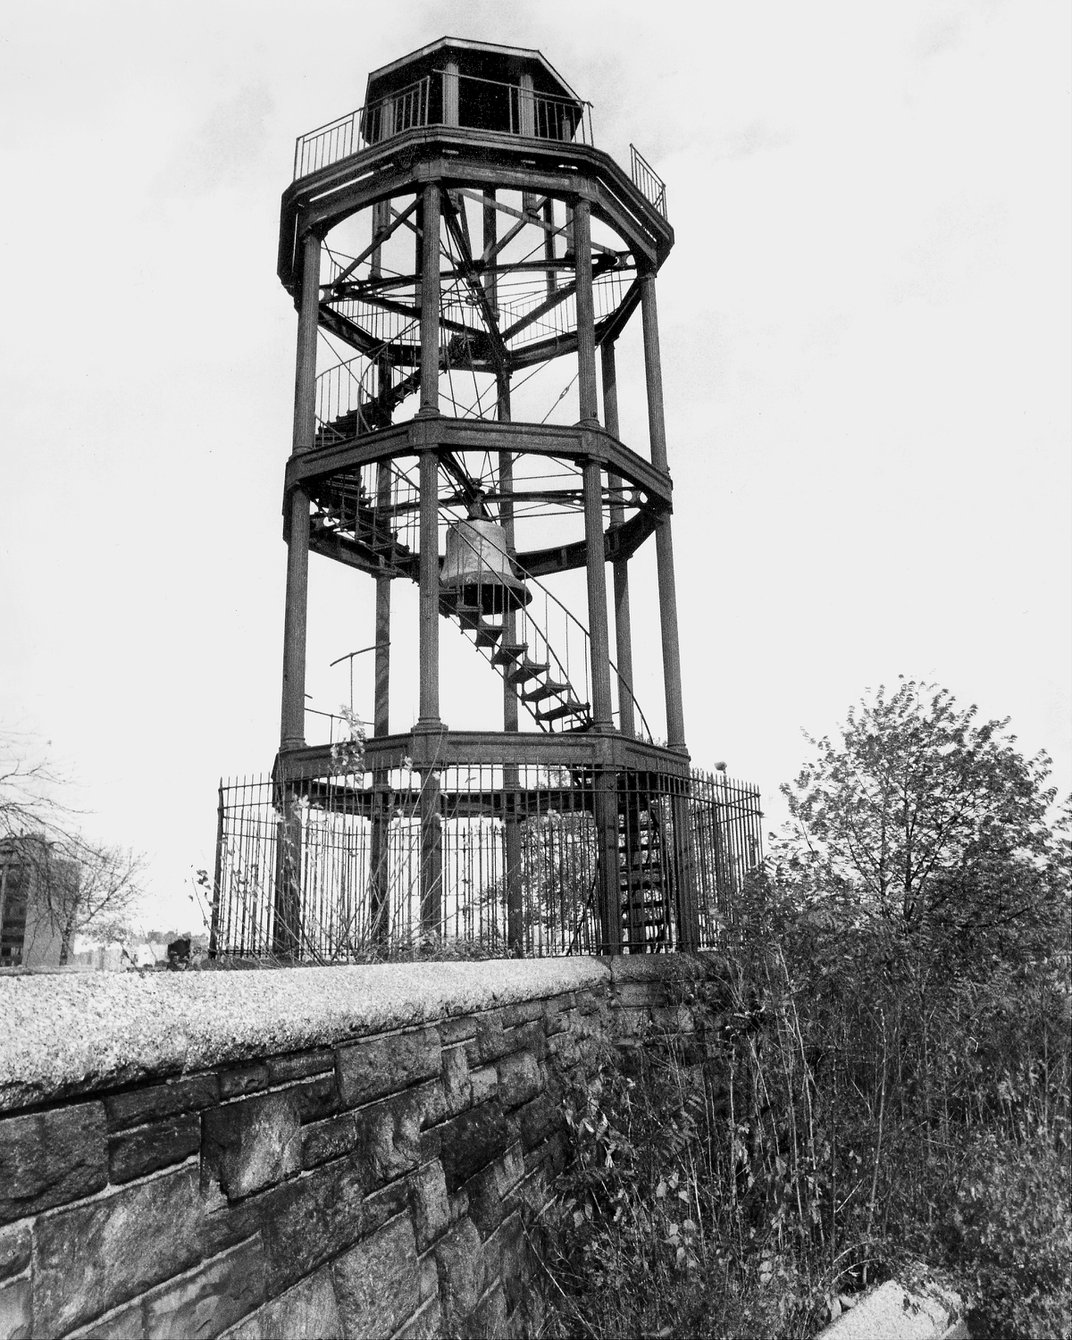 New York's Last Fire Watchtower Has Been Restored